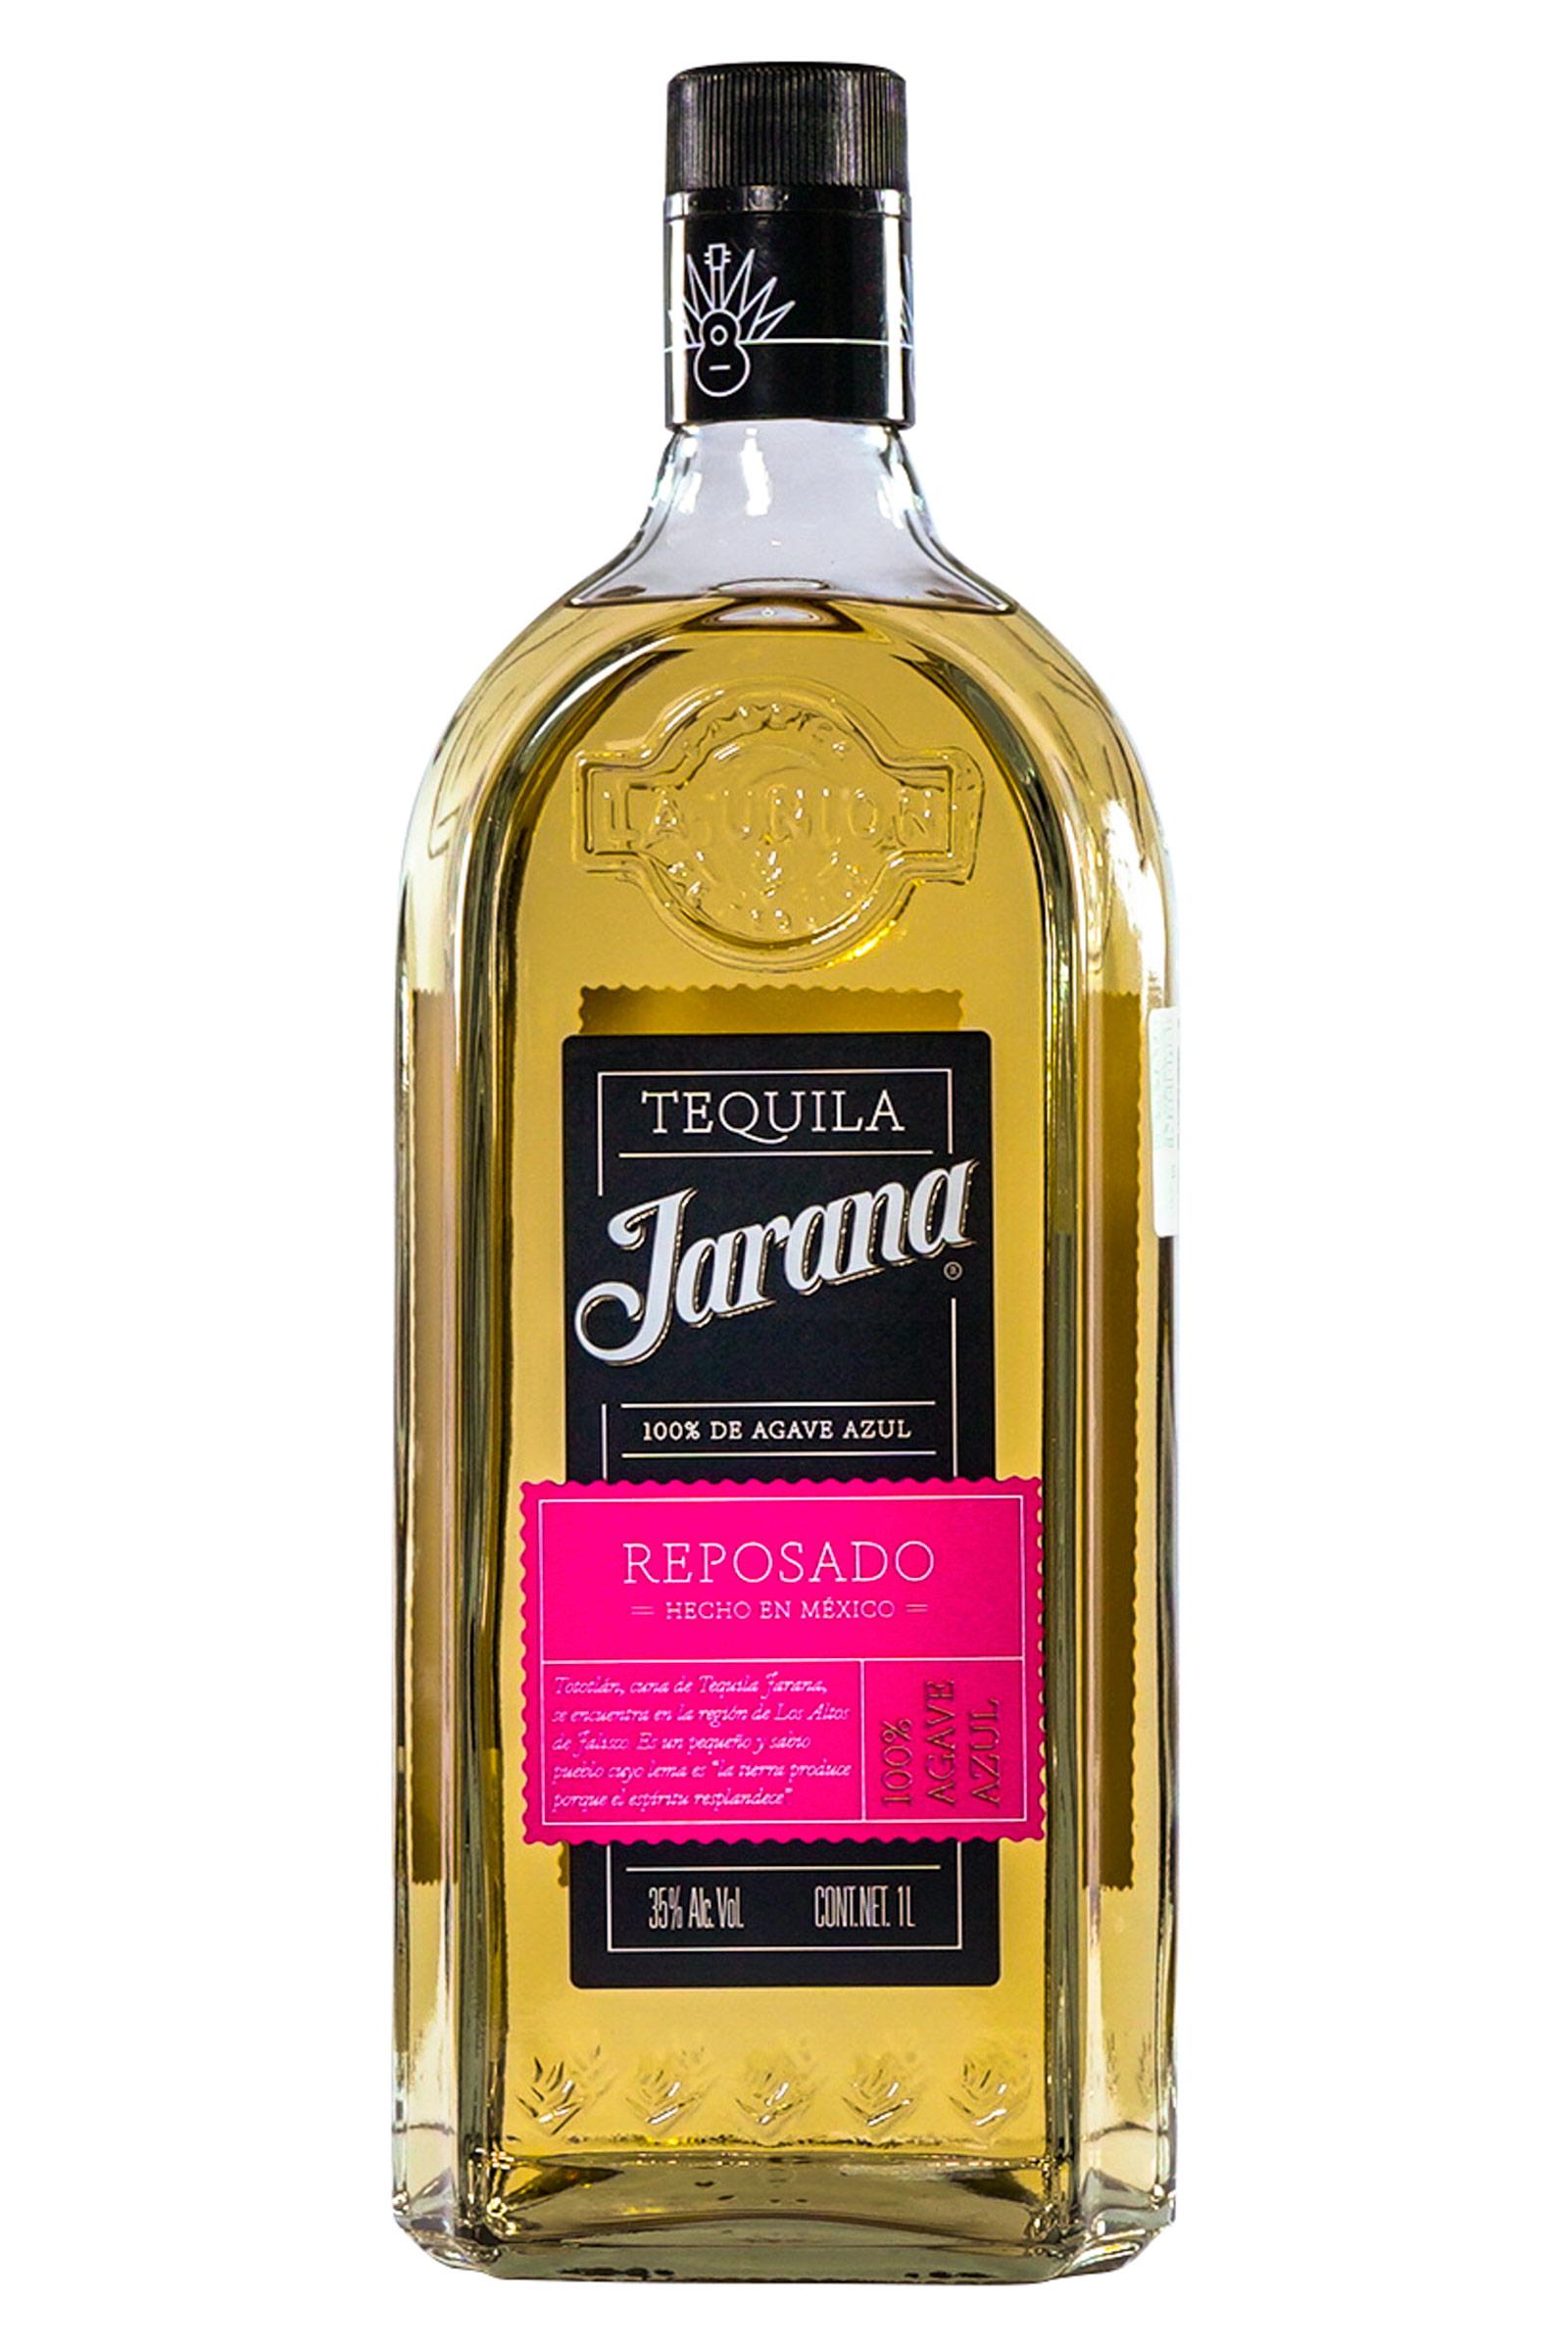 Tequila Jarana Reposado 100% Agave 1000ml